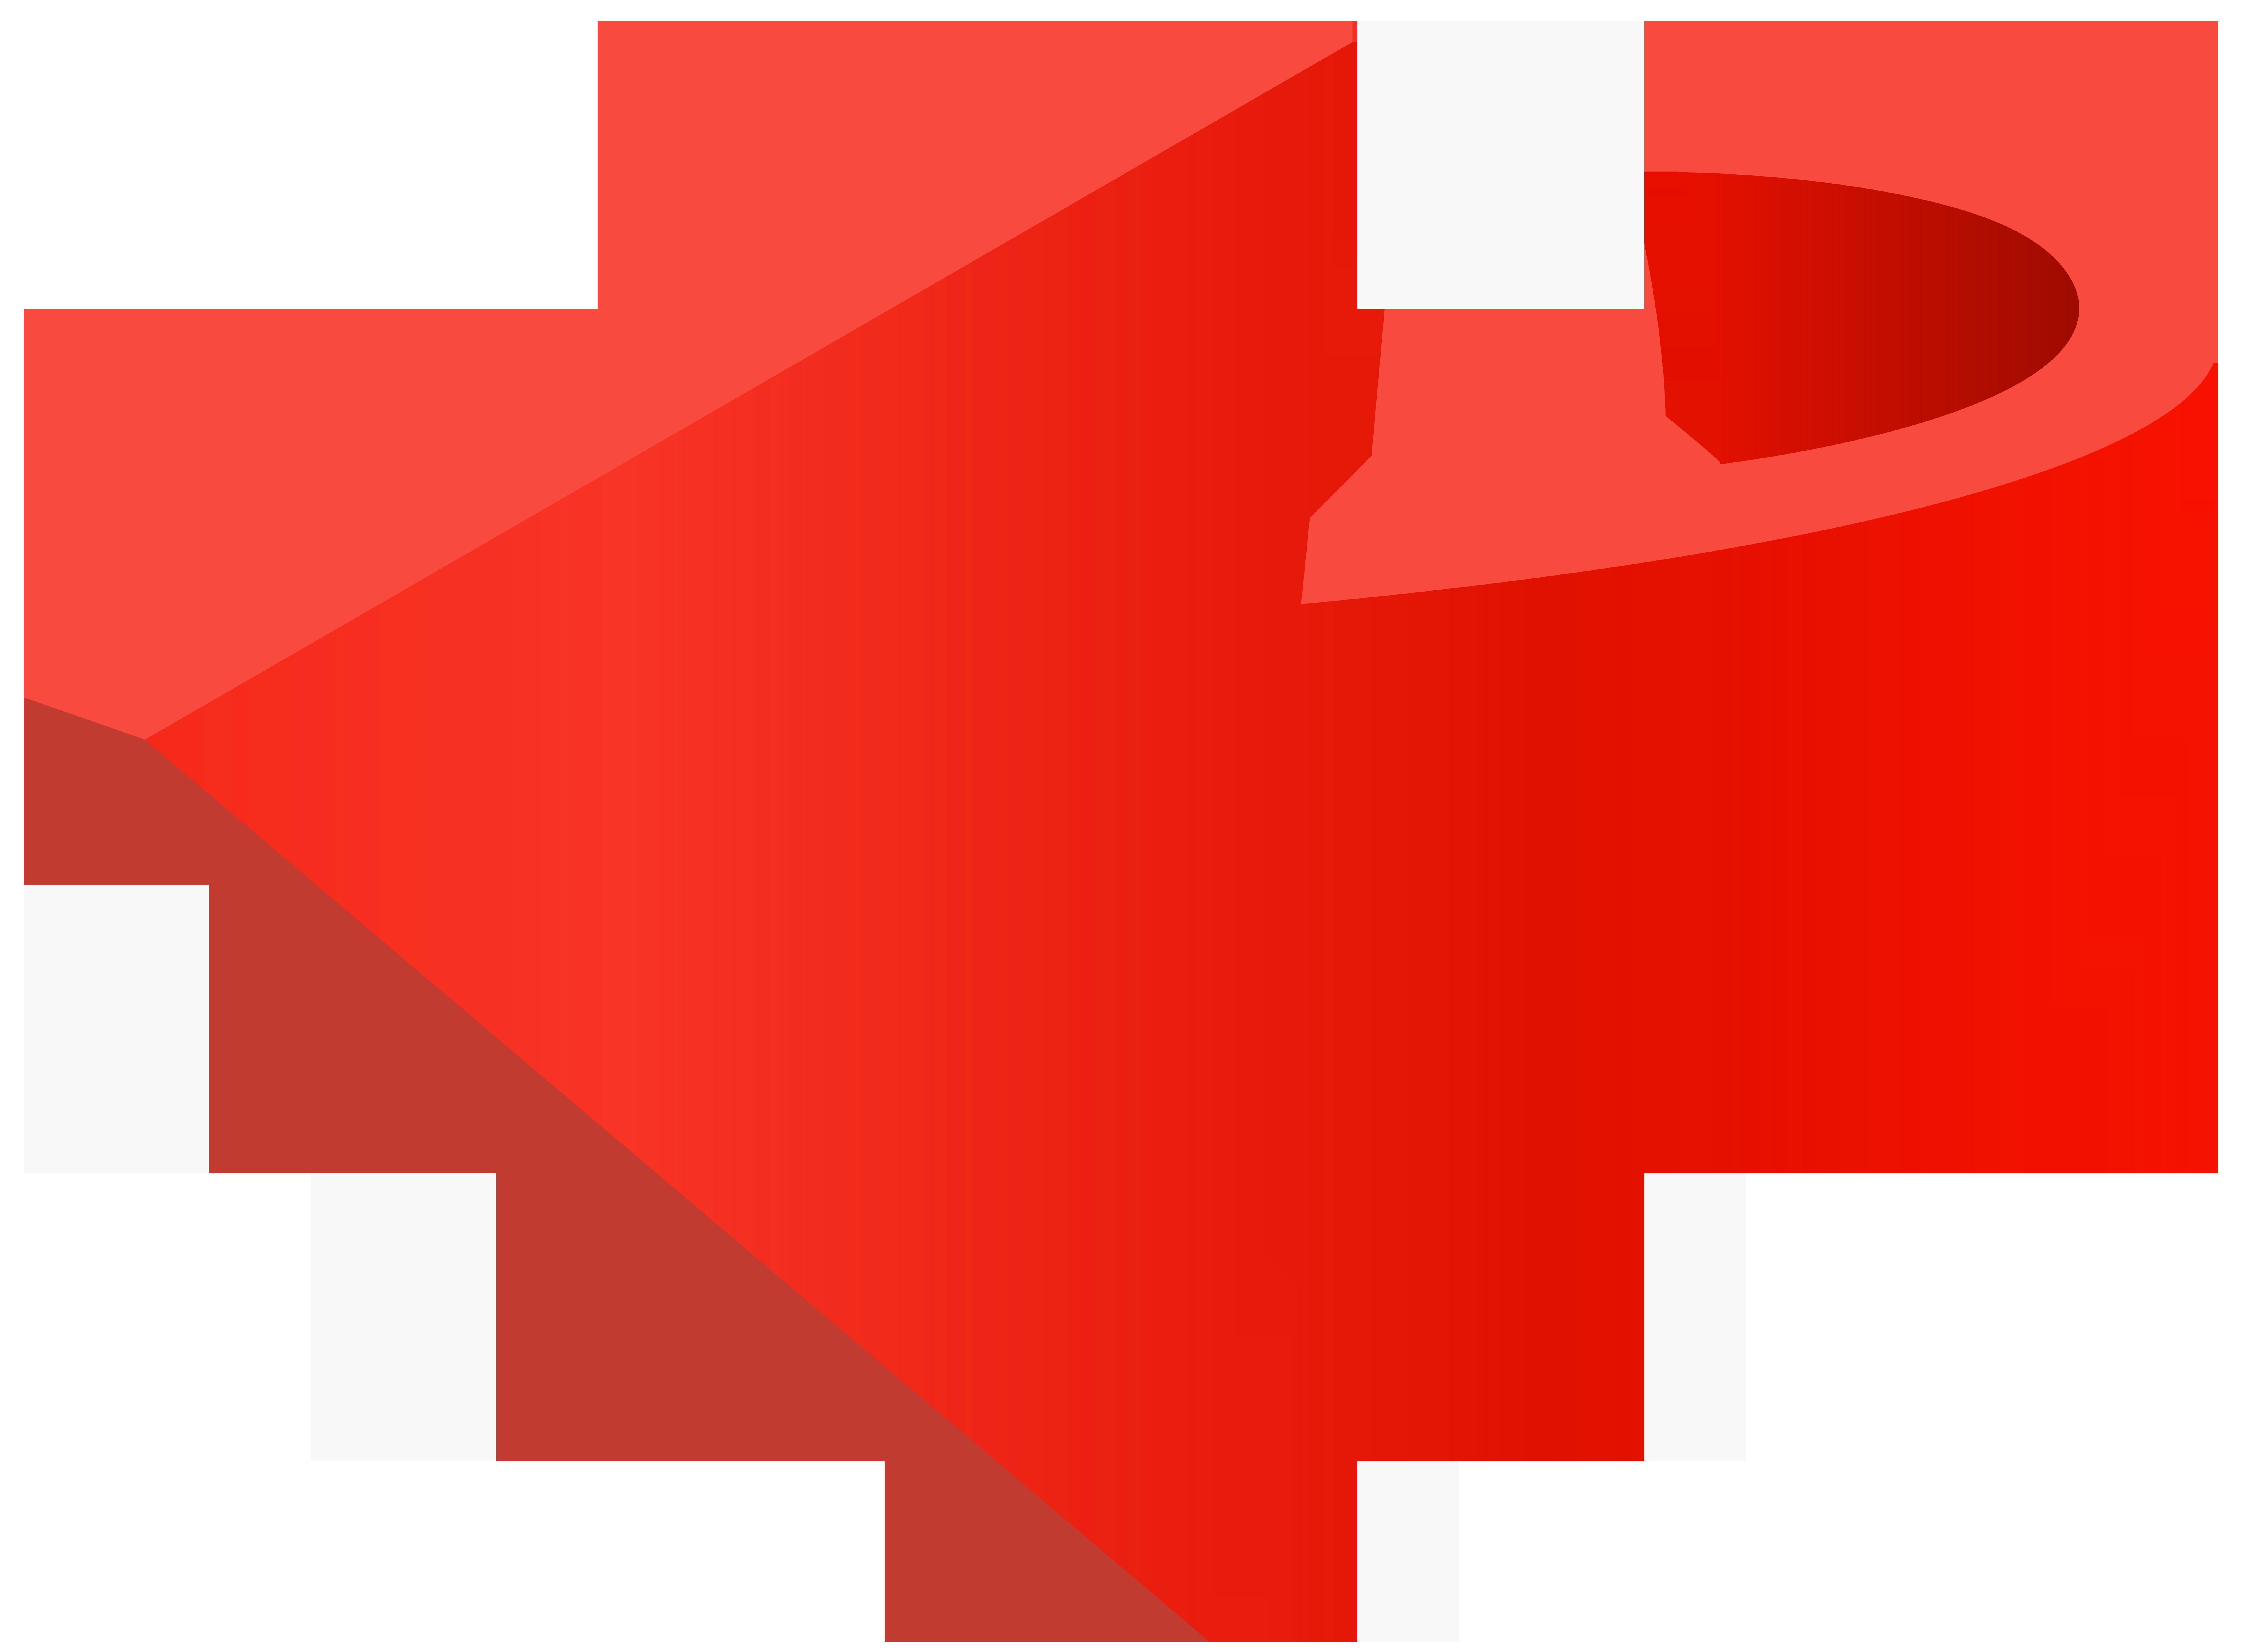 Left Red Arrow Transparent Png Clip Art Image Clip Art Free Clip Art Red Arrow